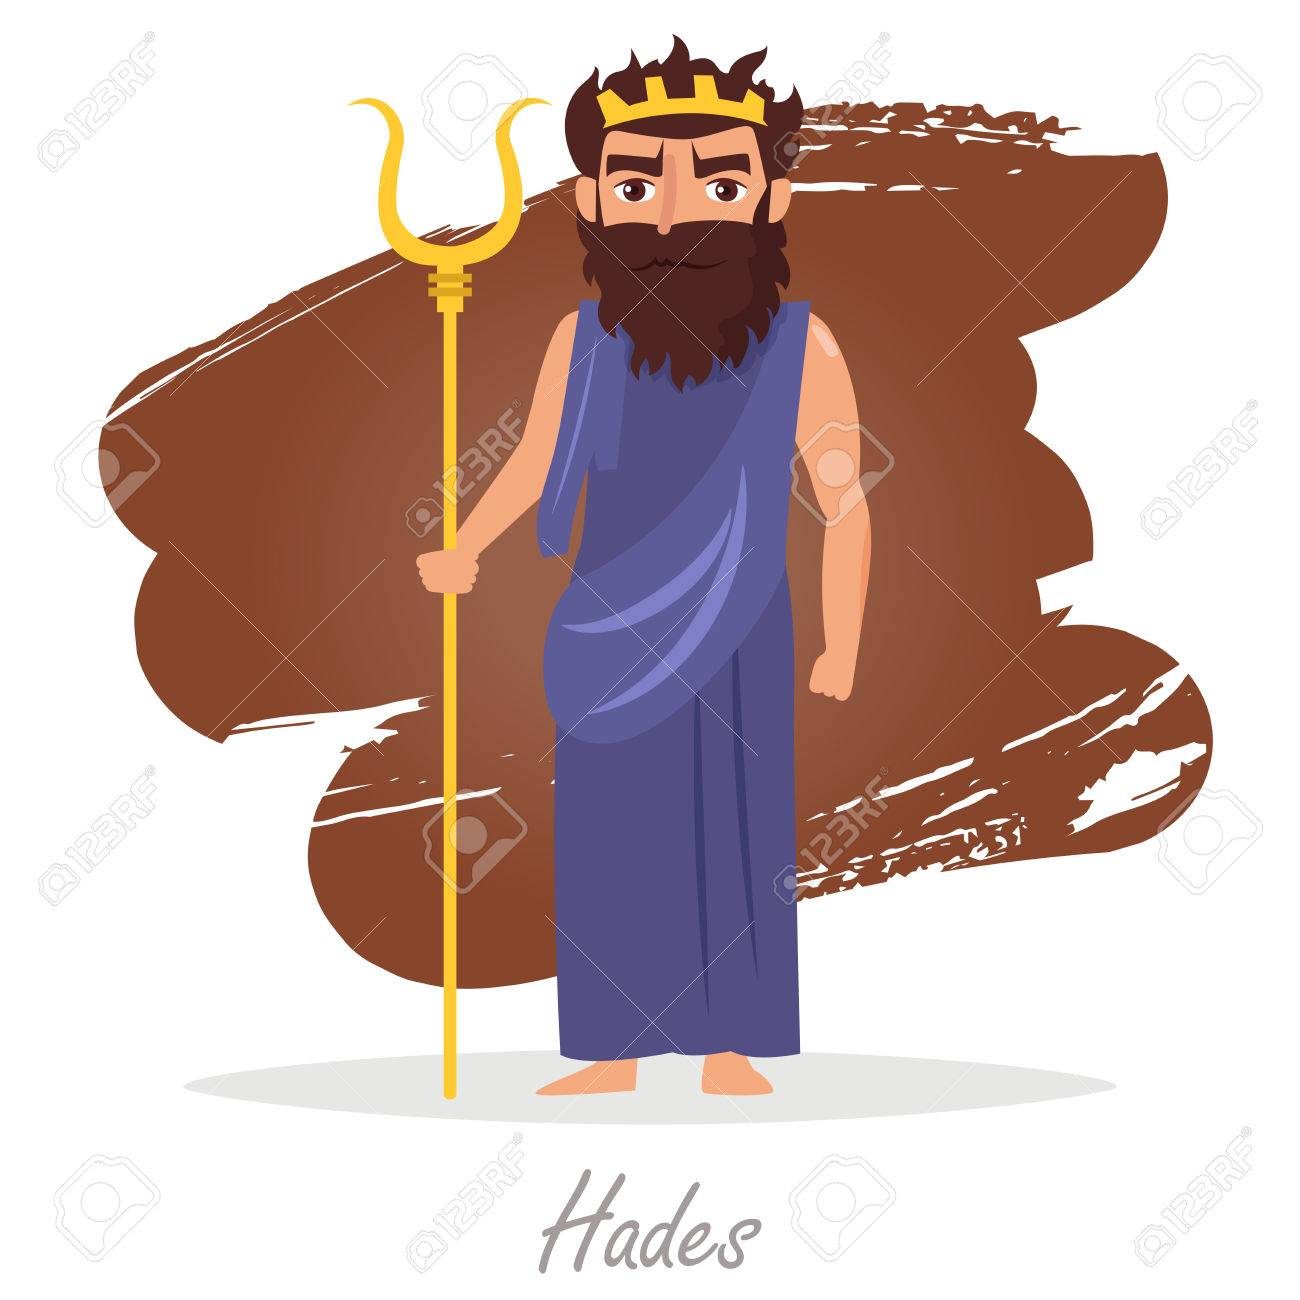 hades greek gods vector royalty free cliparts vectors and stock rh 123rf com hades clipart black and white hades god clipart